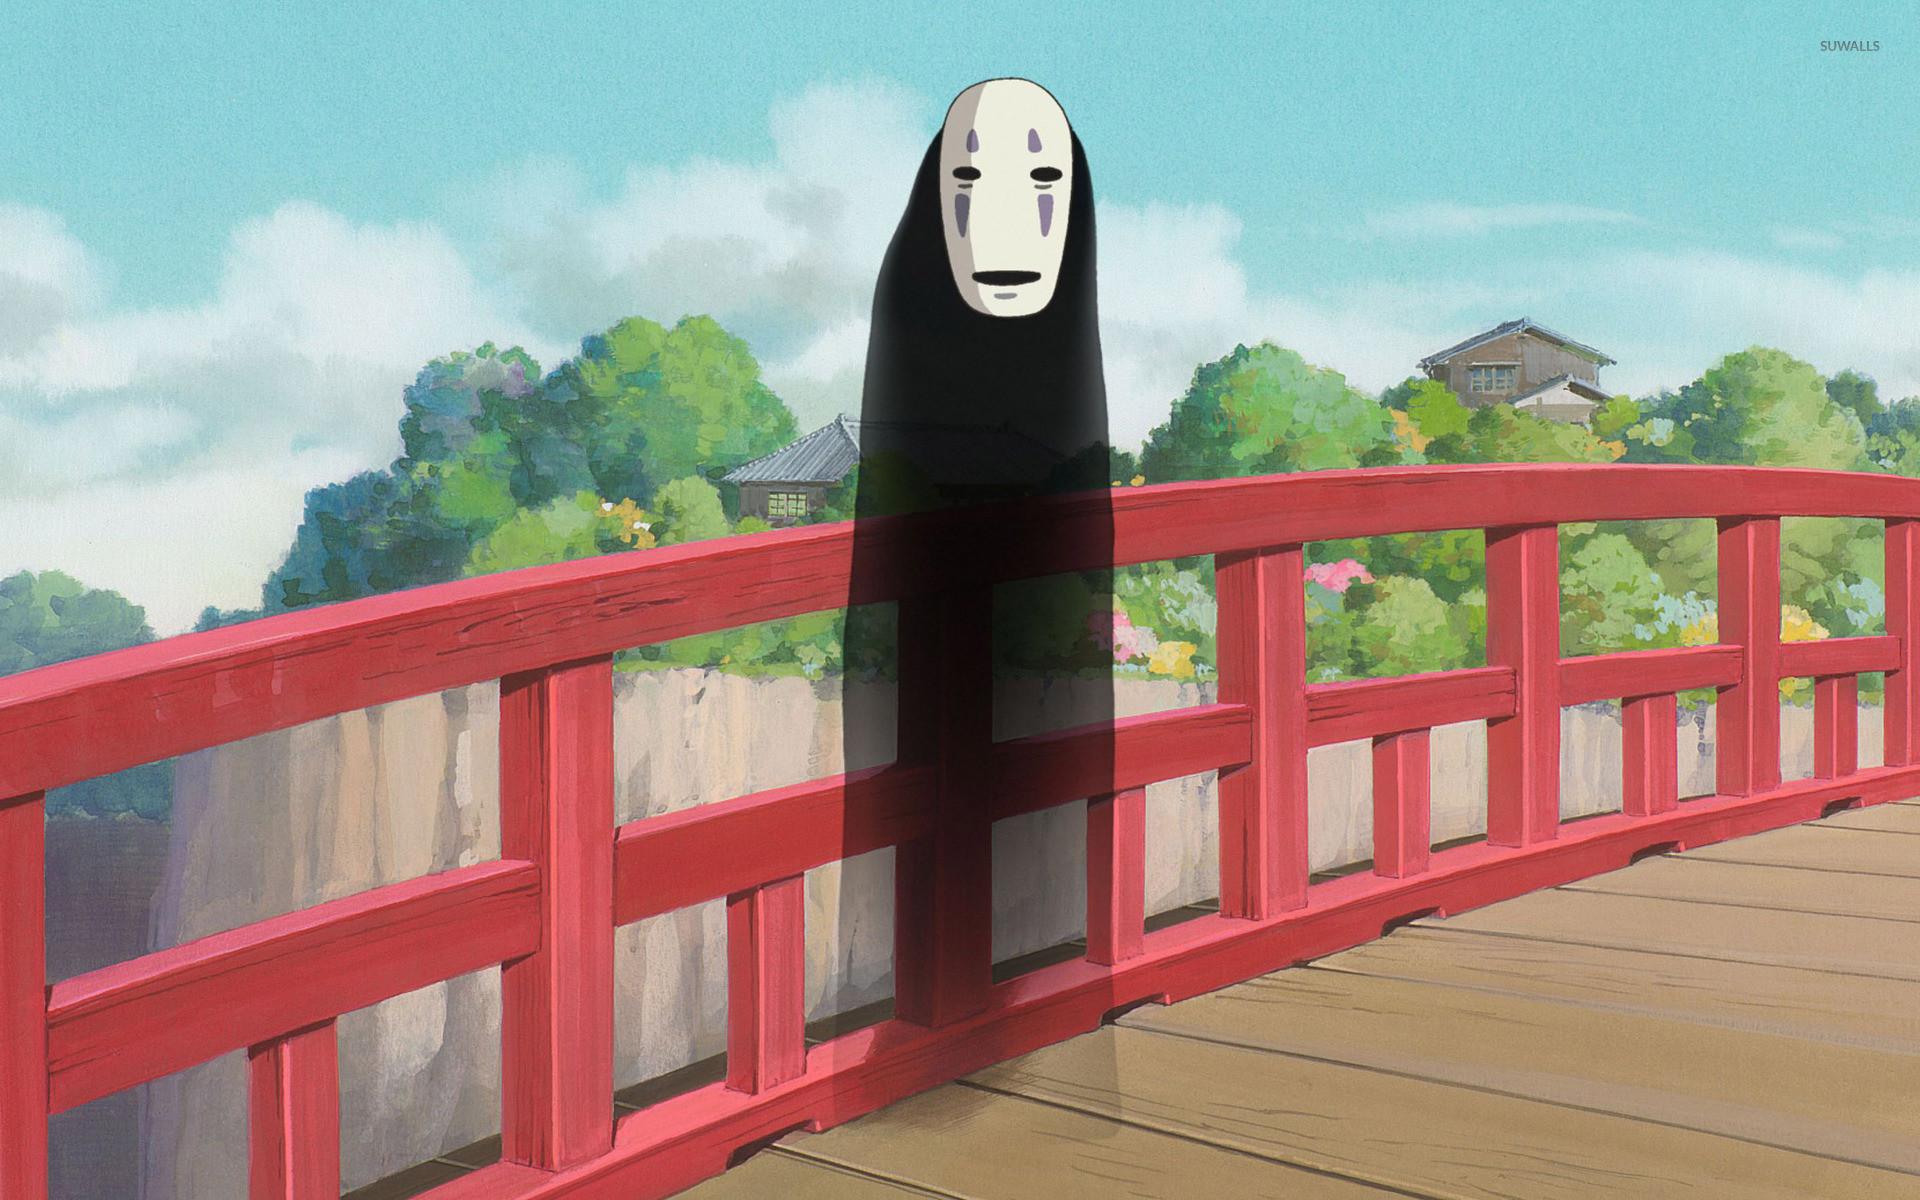 Studio Ghibli Eating GIF by Spirited Away  Find   GIPHY